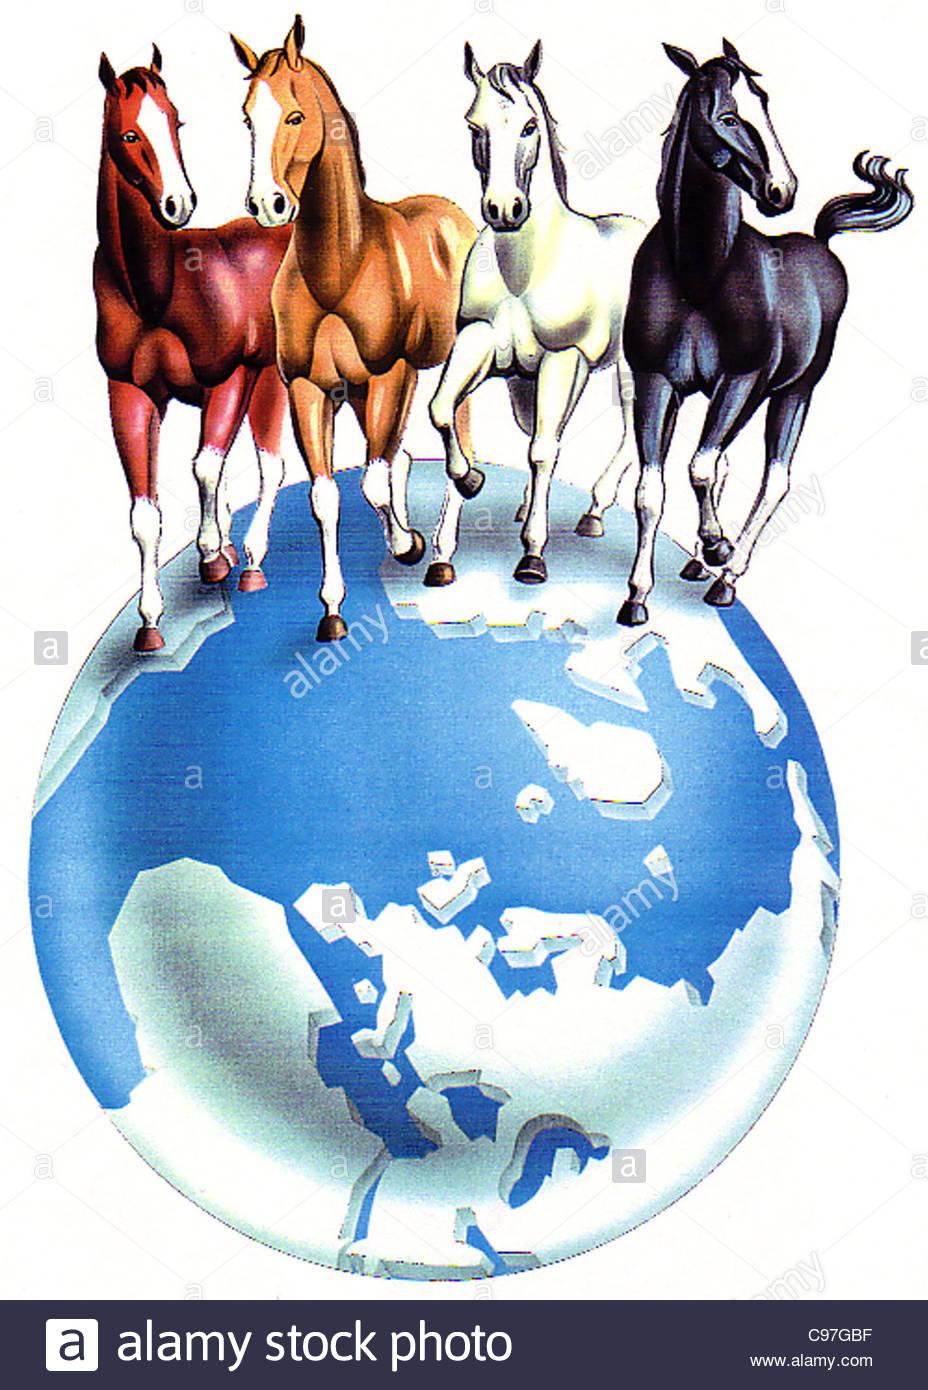 4 horses on globe earth globe geography globe globe world map map 4 horses on globe earth globe geography globe globe world map map software gumiabroncs Images